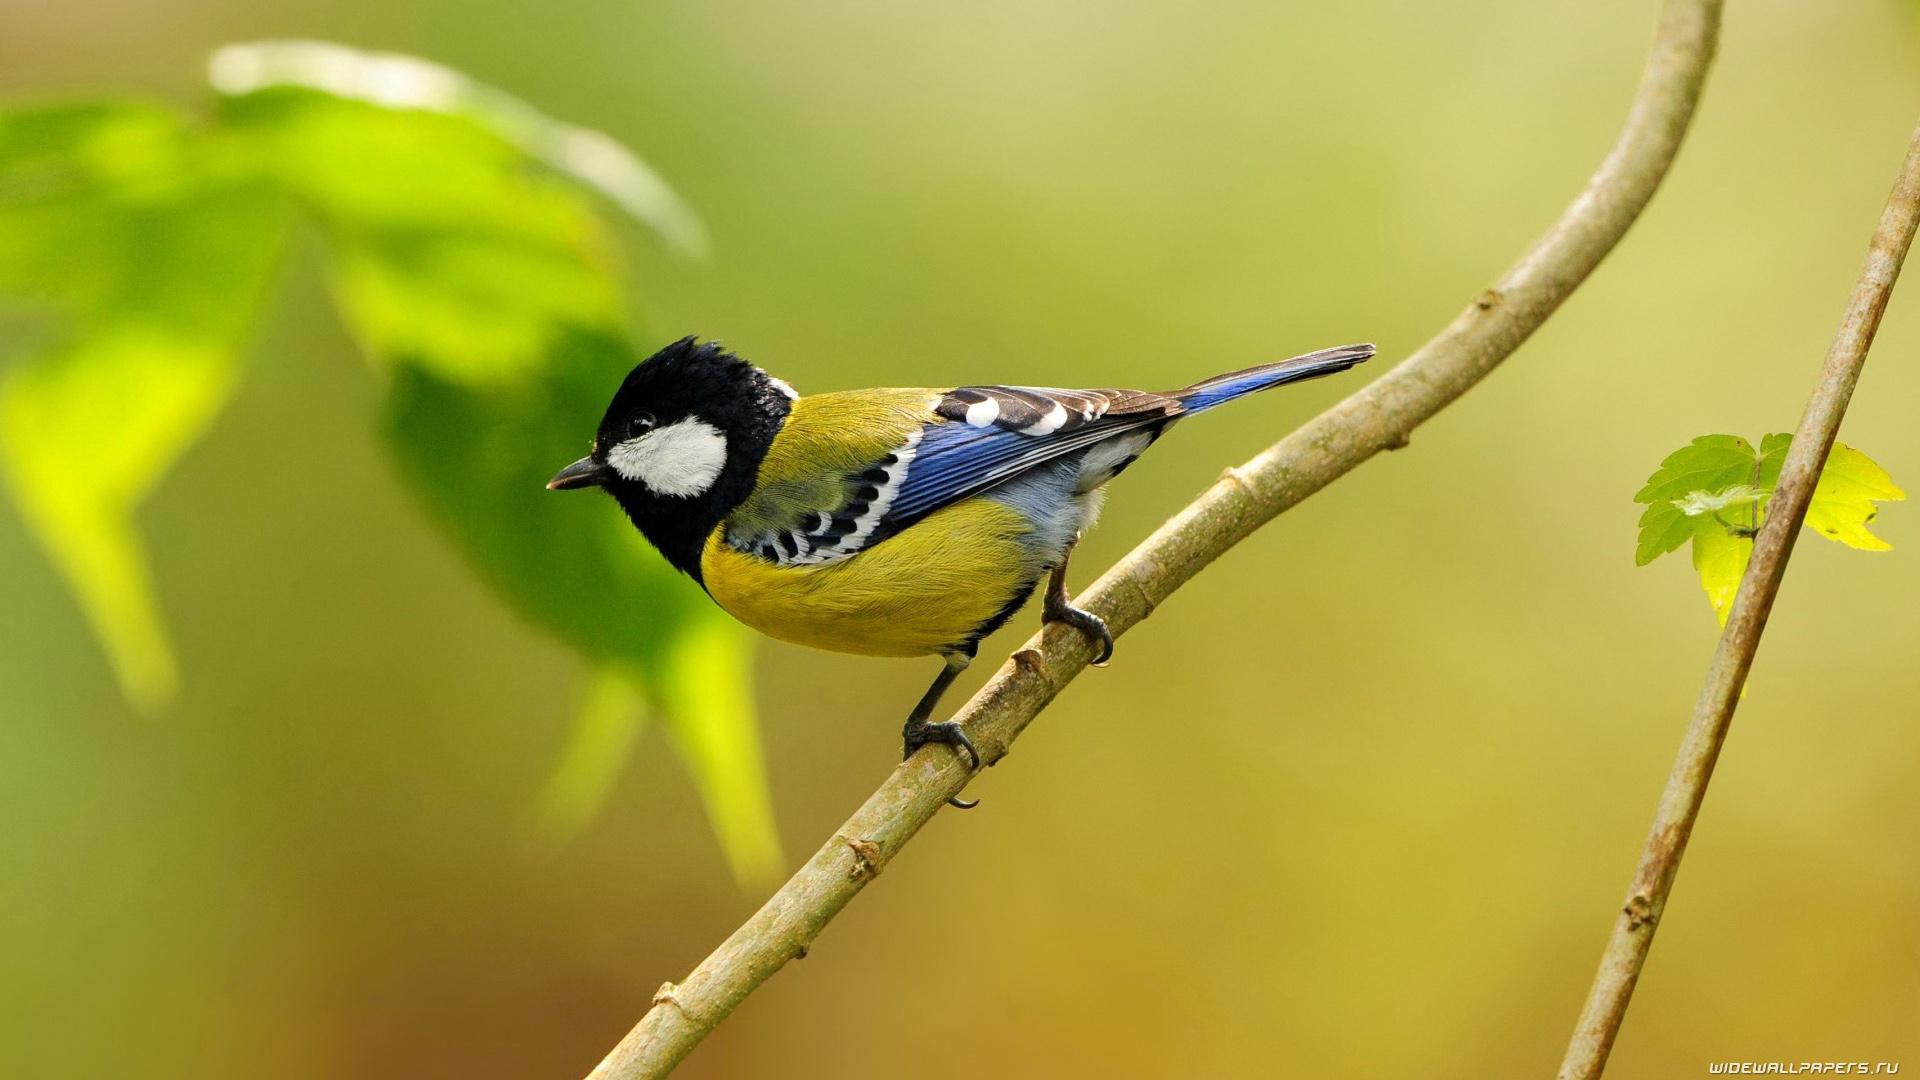 bird-wallpaper-09.jpg ...